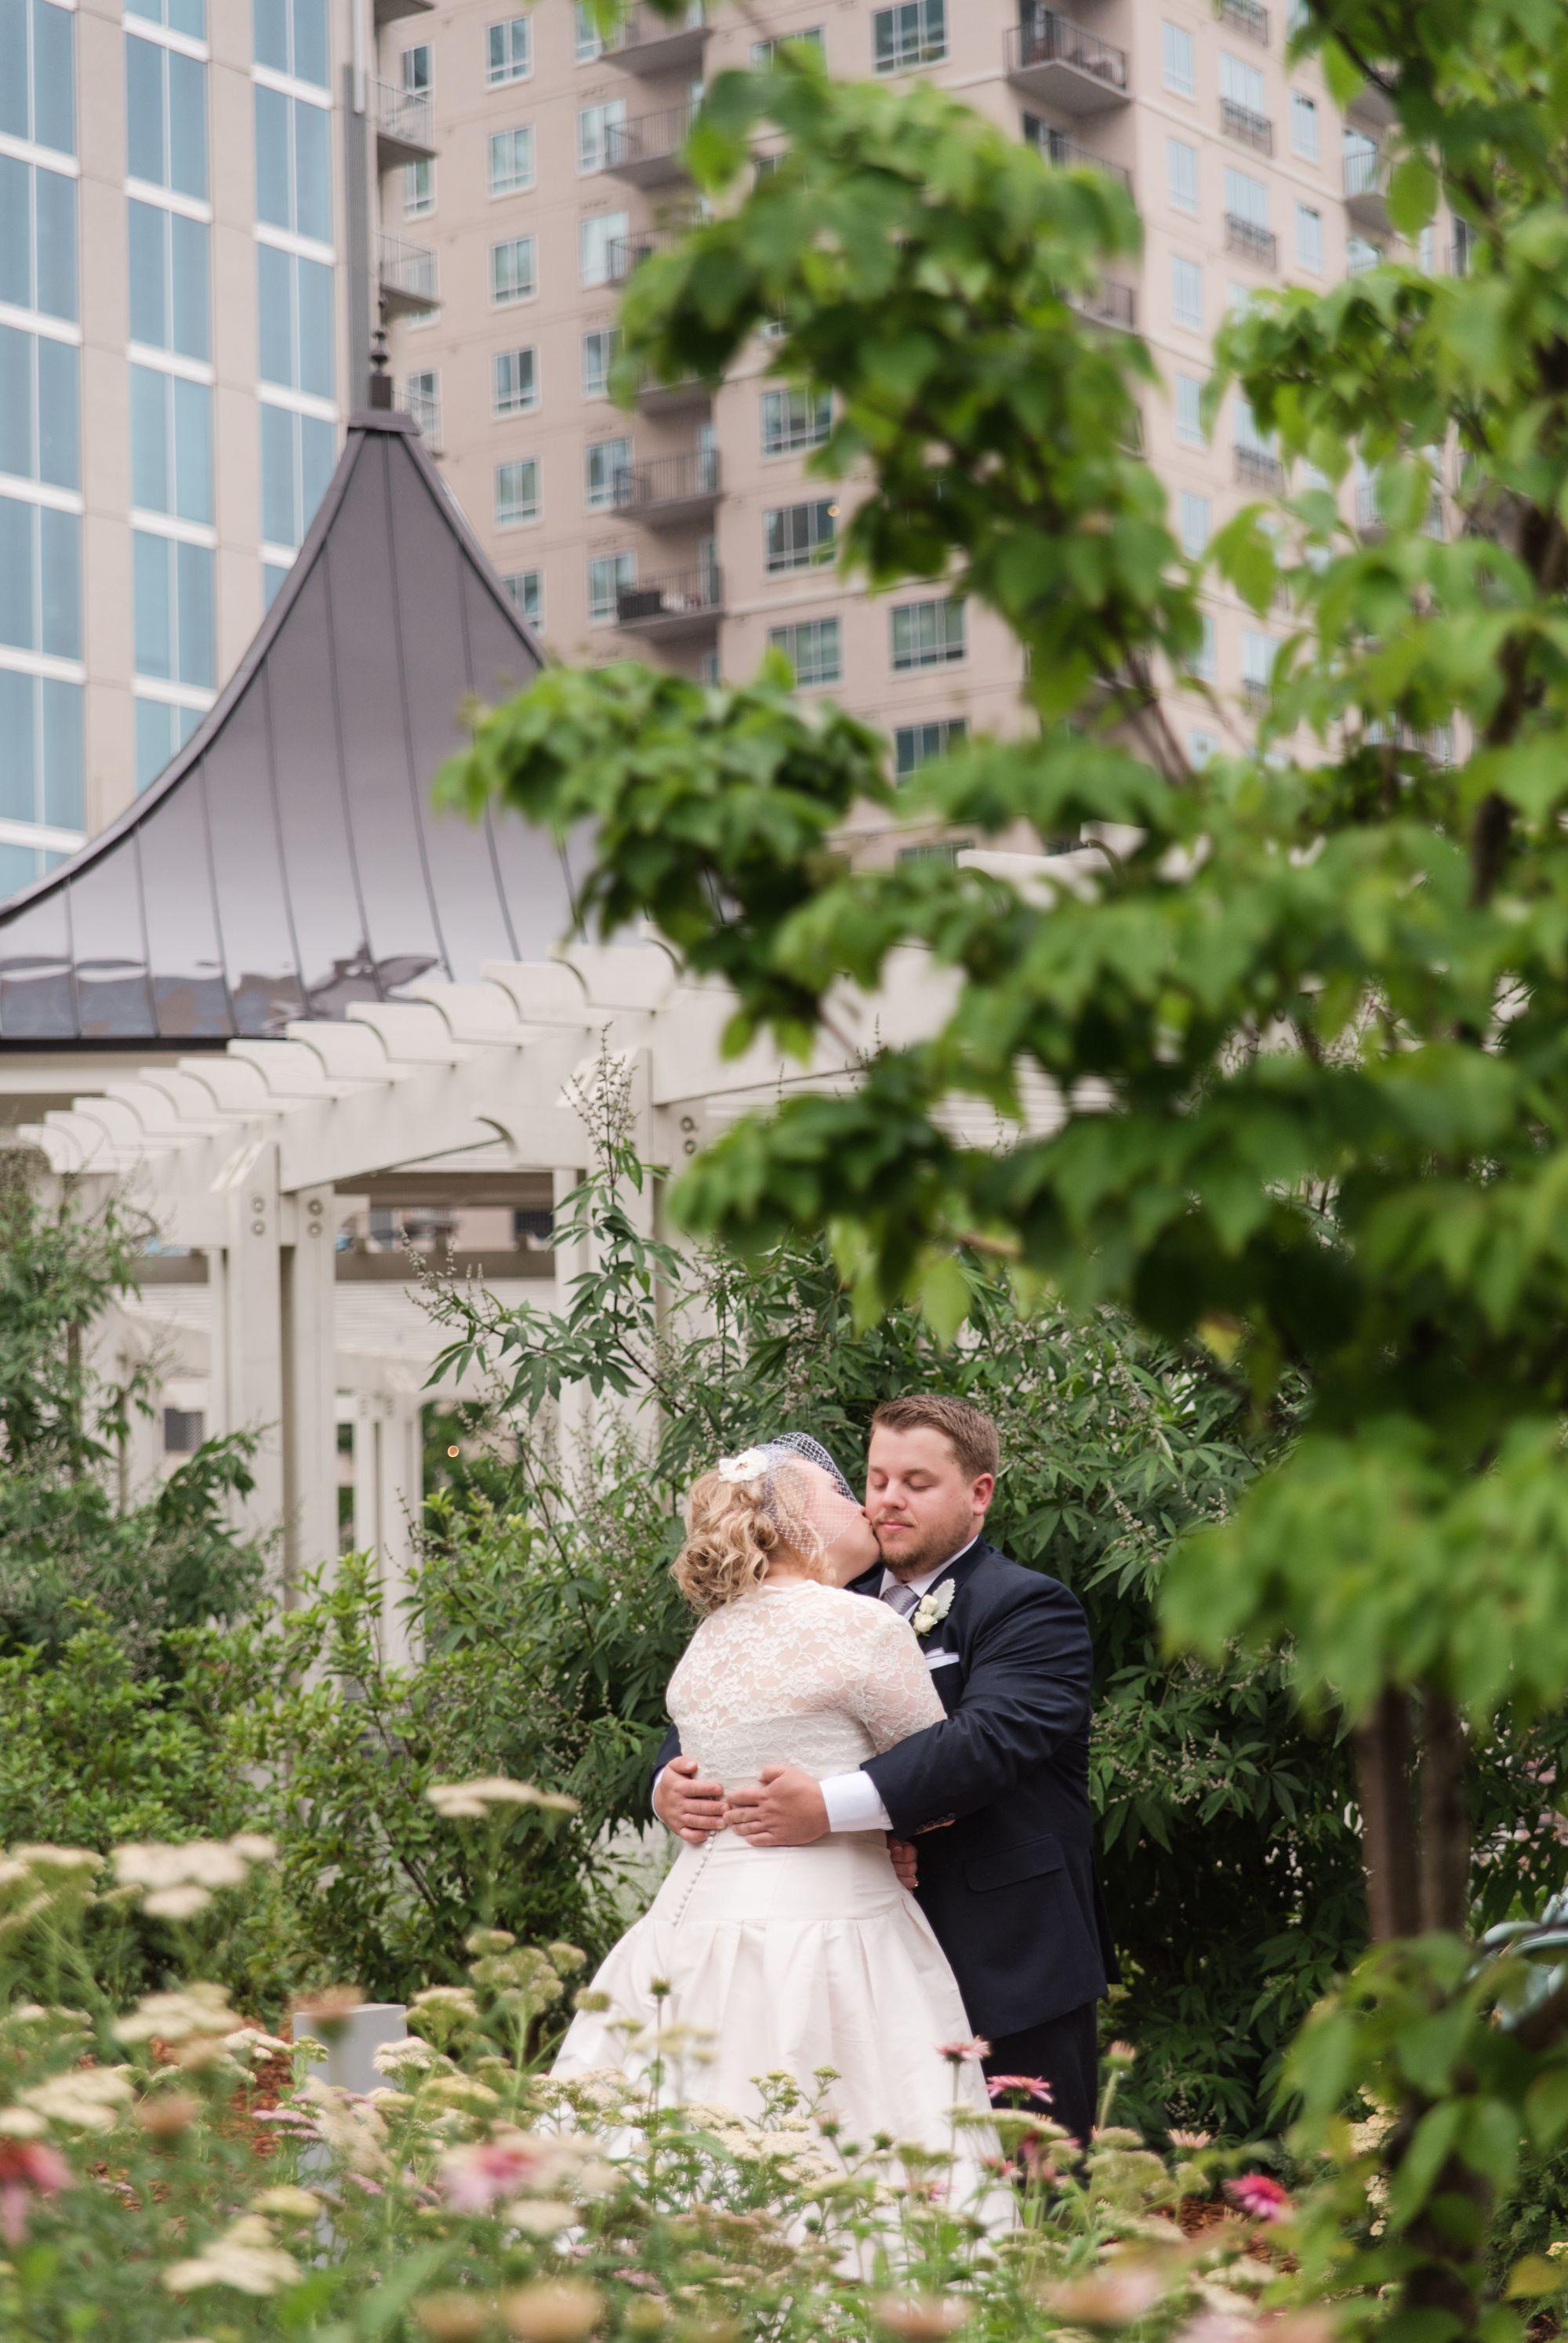 uptown-charlotte-warhouse-wedding-38.jpg